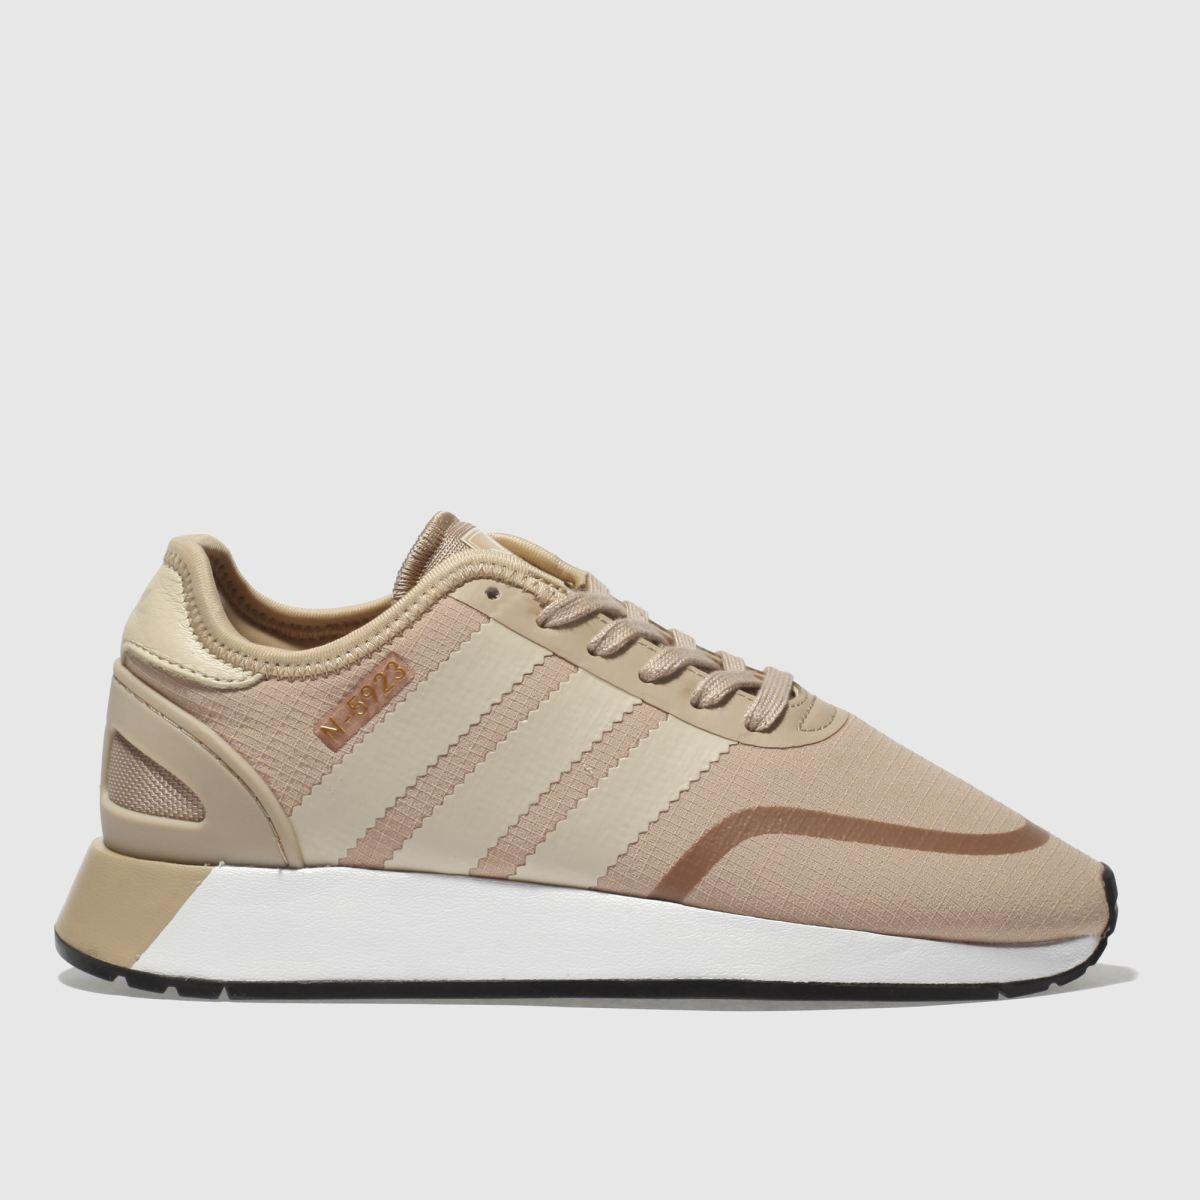 Adidas Beige N-5923 Trainers